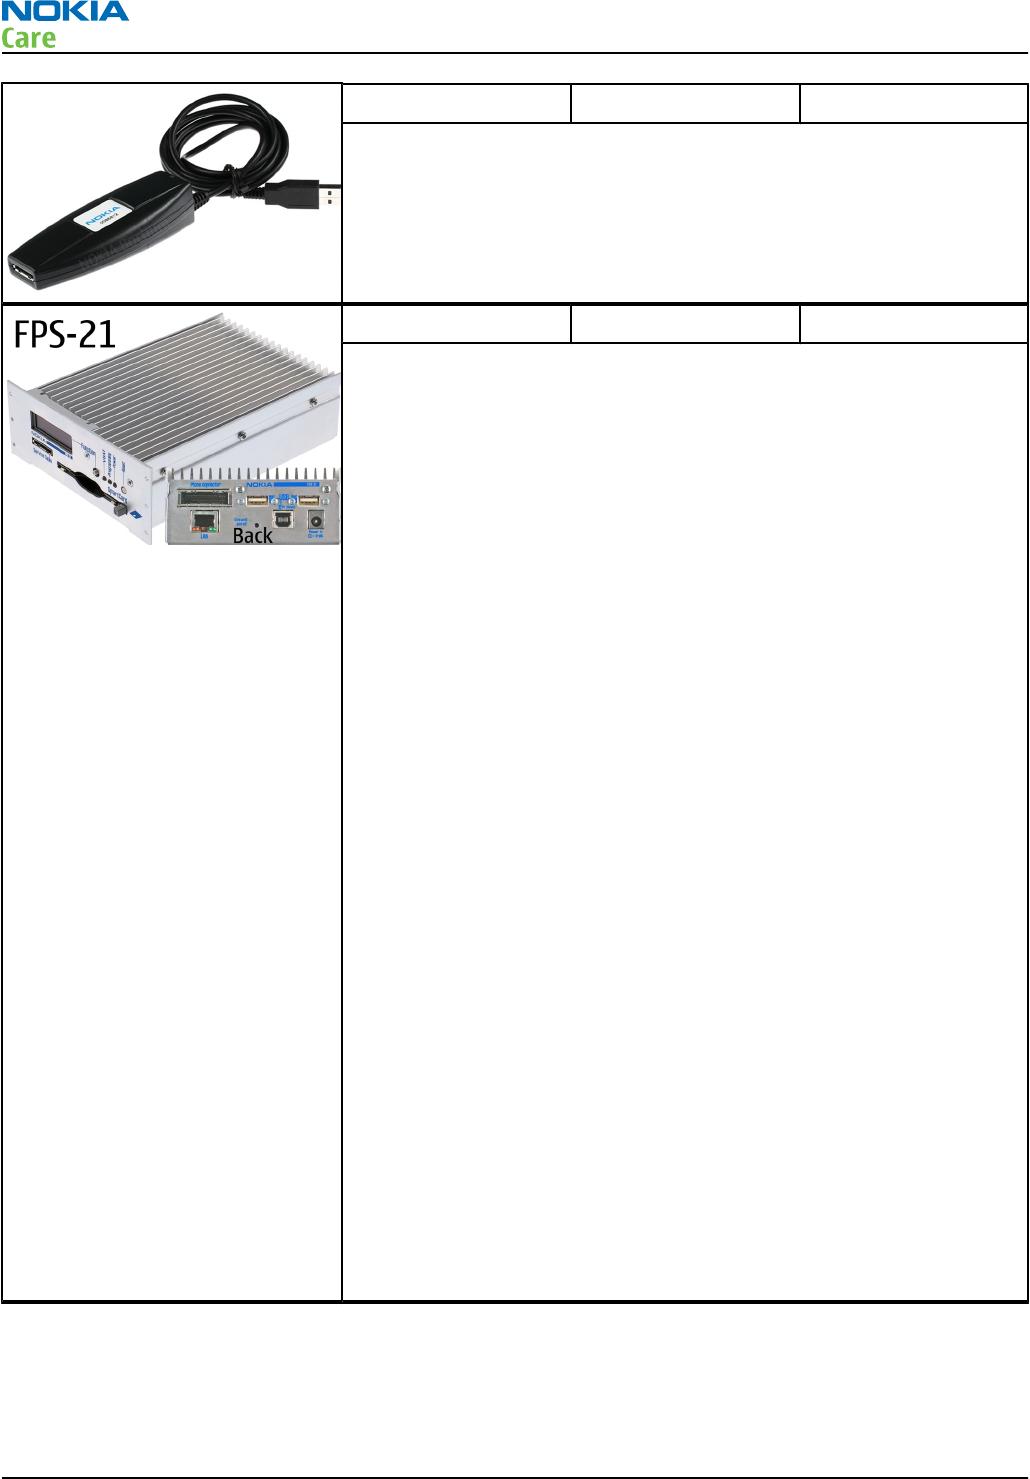 Nokia C6 00 Rm 612 624 Service Manual 34 V1 Led Backlight Smd 2828 15w 3v Fls 5 Flash Device